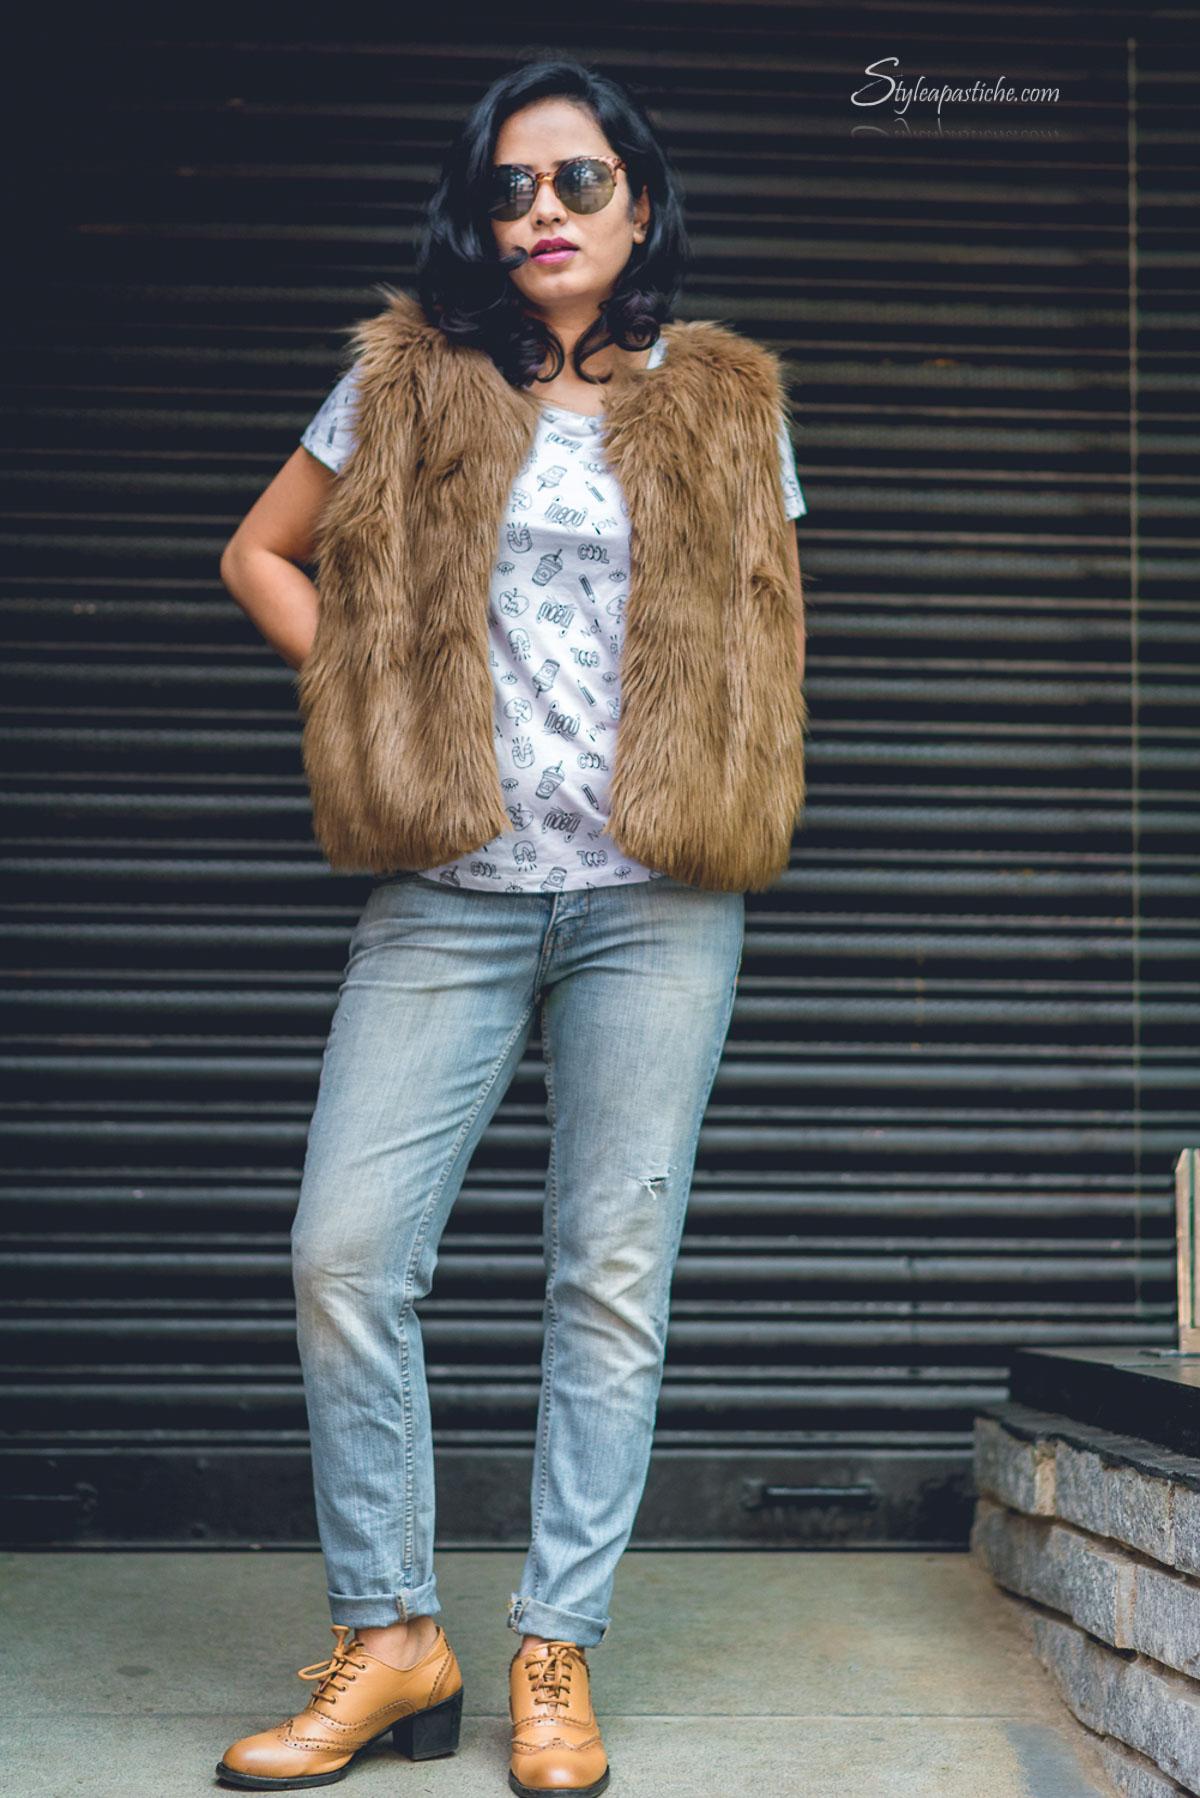 Indian Fashion Beauty Lifestyle Blog Styleapastiche, Indian Streetstyle winterwear ootd fur coat and velvet, how to wear fur coat and velvet for winter, two ways to wear fur coat in winter